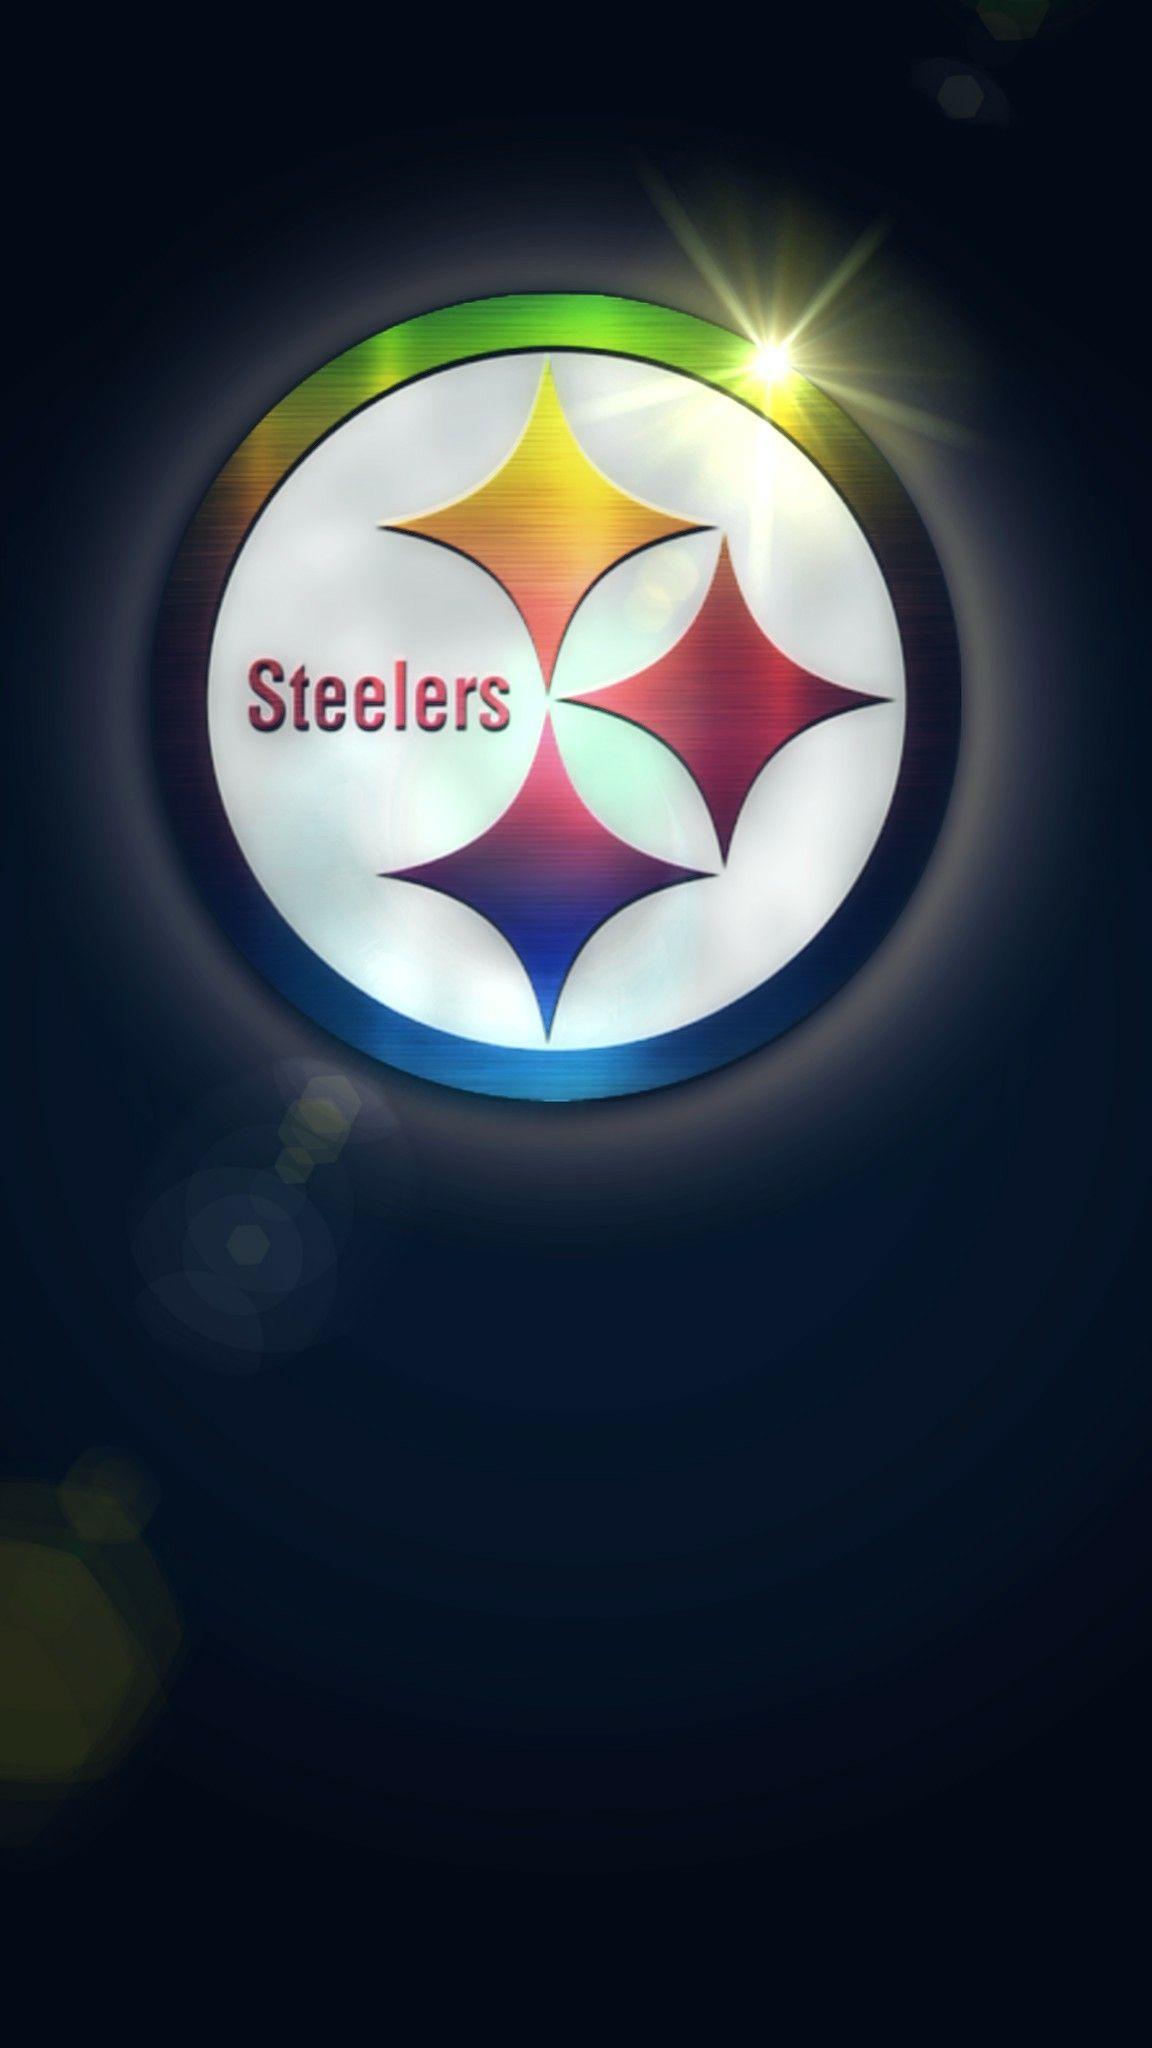 Pittsburgh Steelers Wallpaper Pittsburgh Steelers Wallpaper Pittsburgh Steelers Logo Steelers